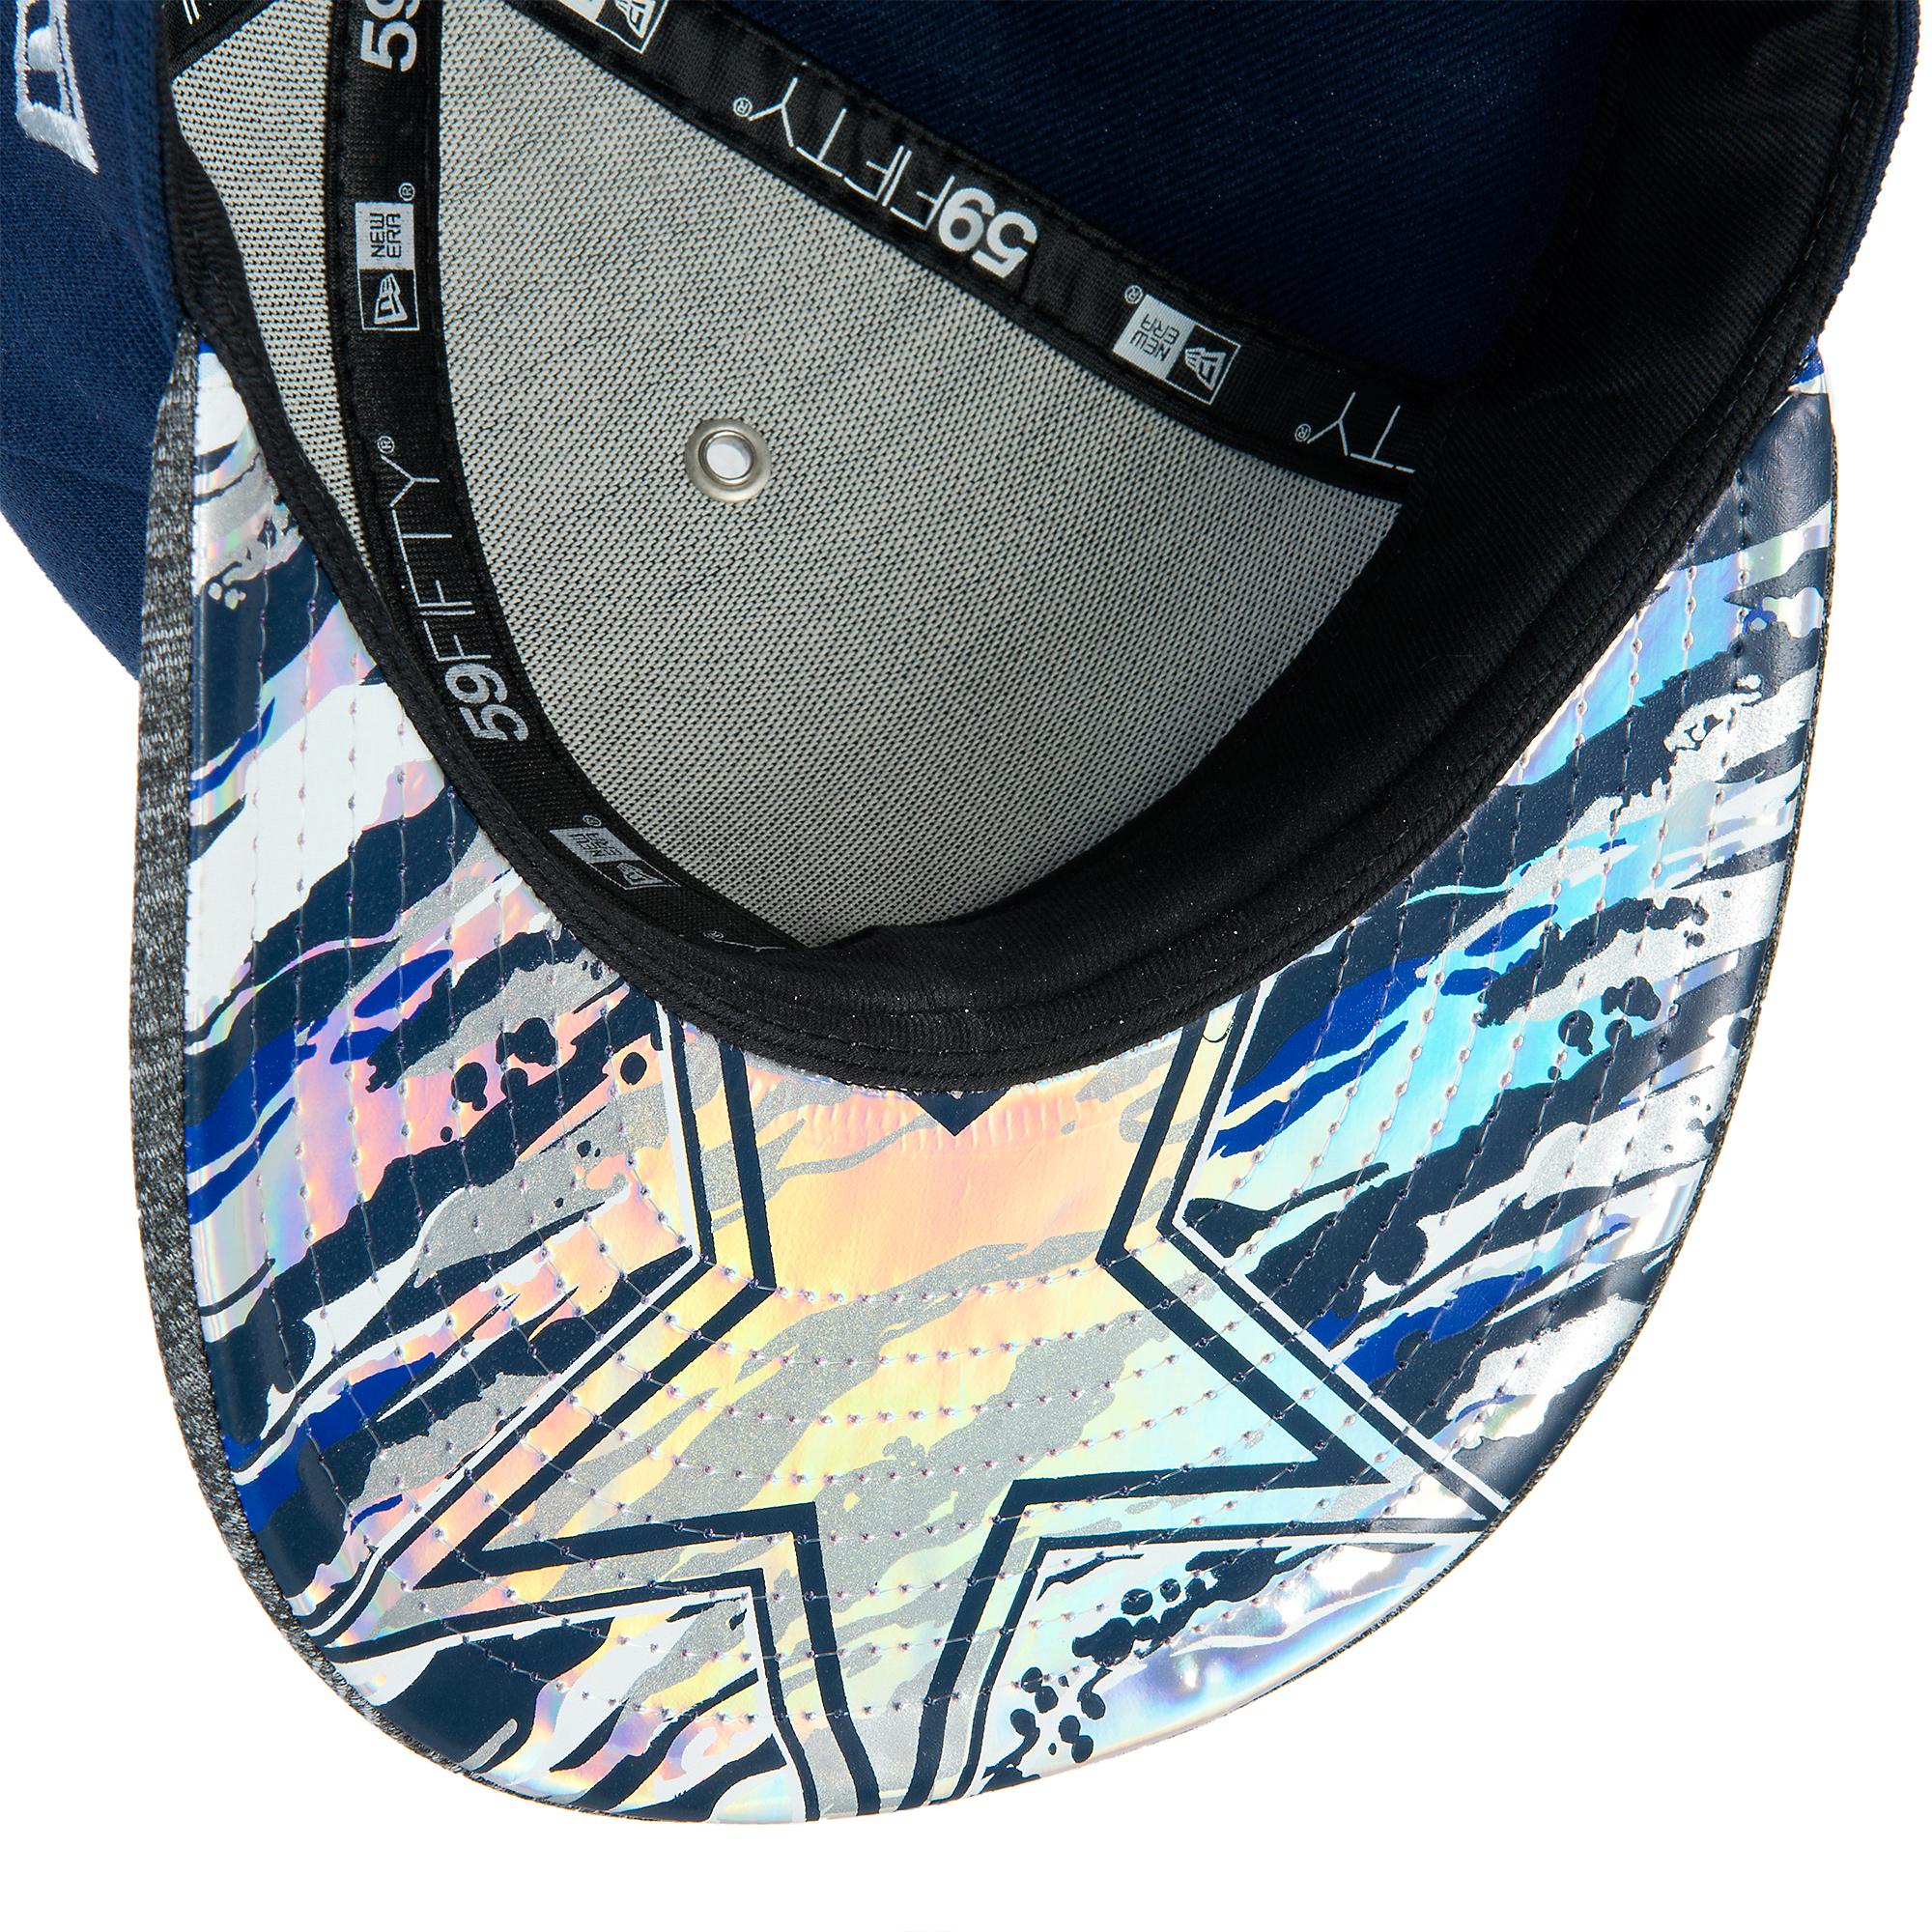 Dallas Cowboys New Era 2016 Mens On Field Draft 59Fifty Cap ... 9319b2ea9